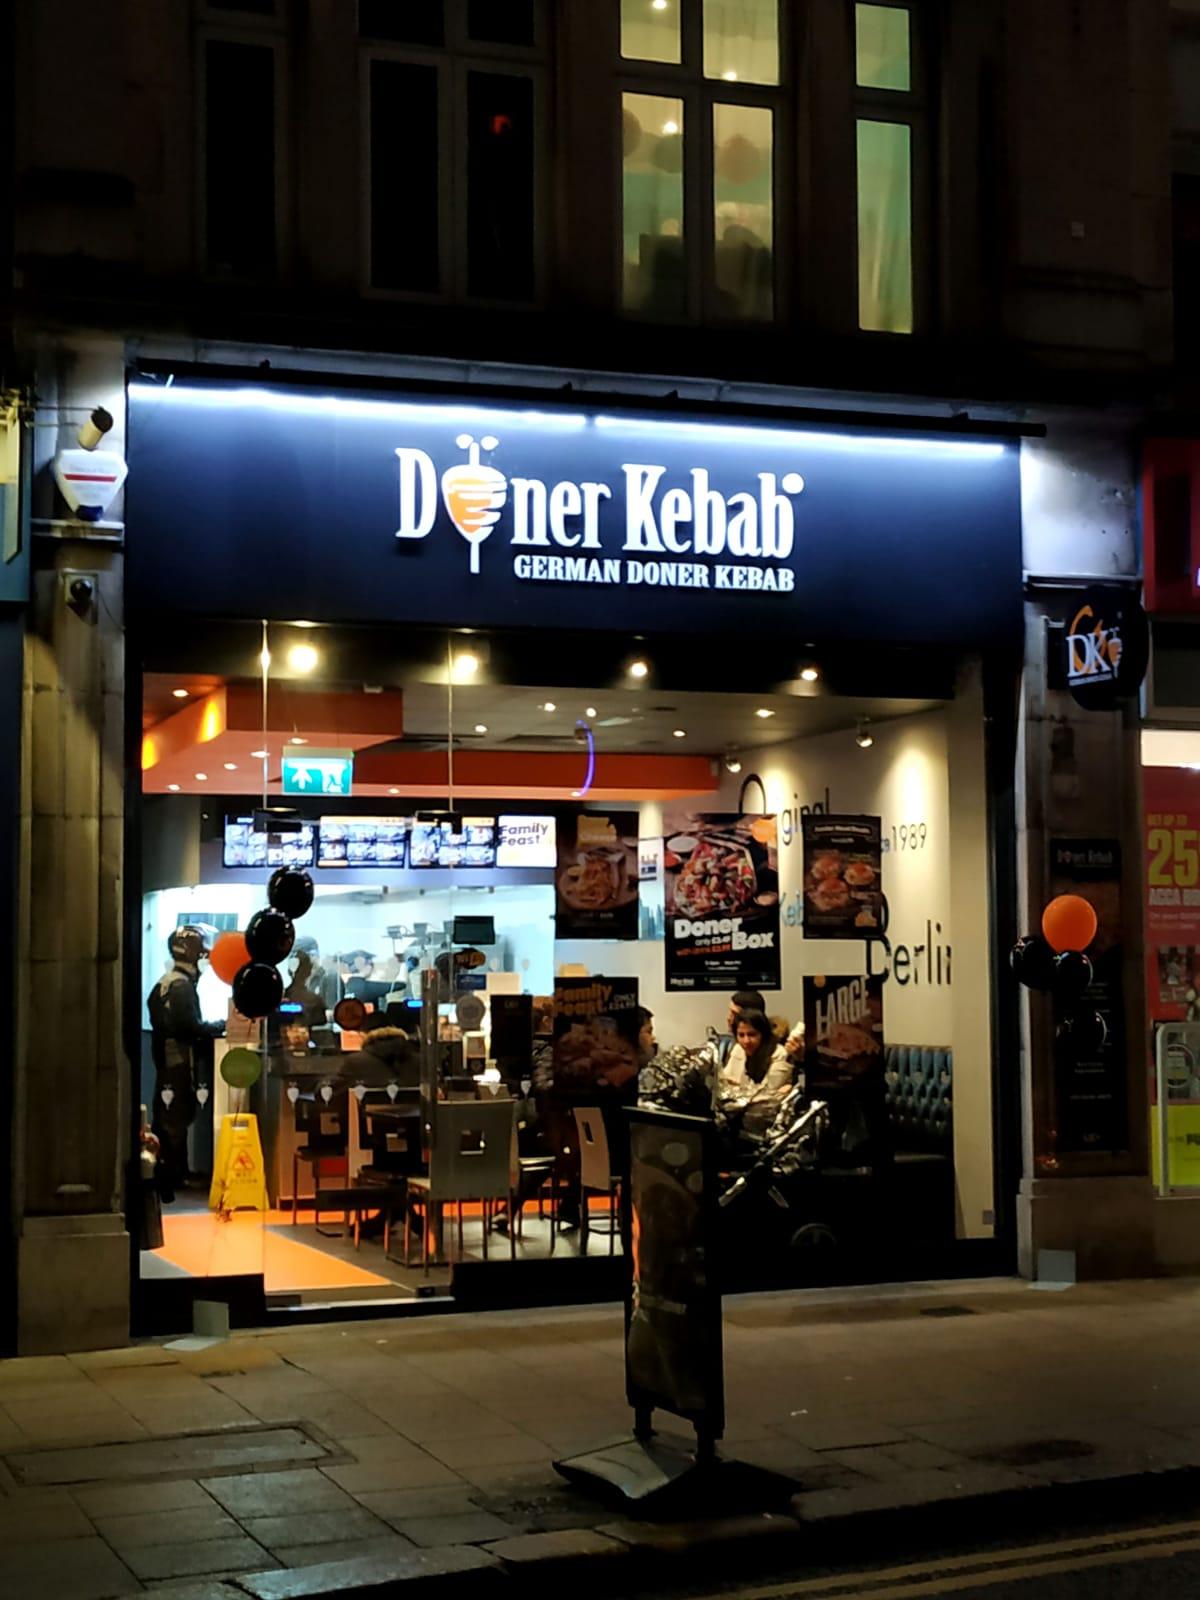 THE LUXURY DONER KEBAB DONE RIGHT AT GERMAN DONER KEBAB IN CROYDON